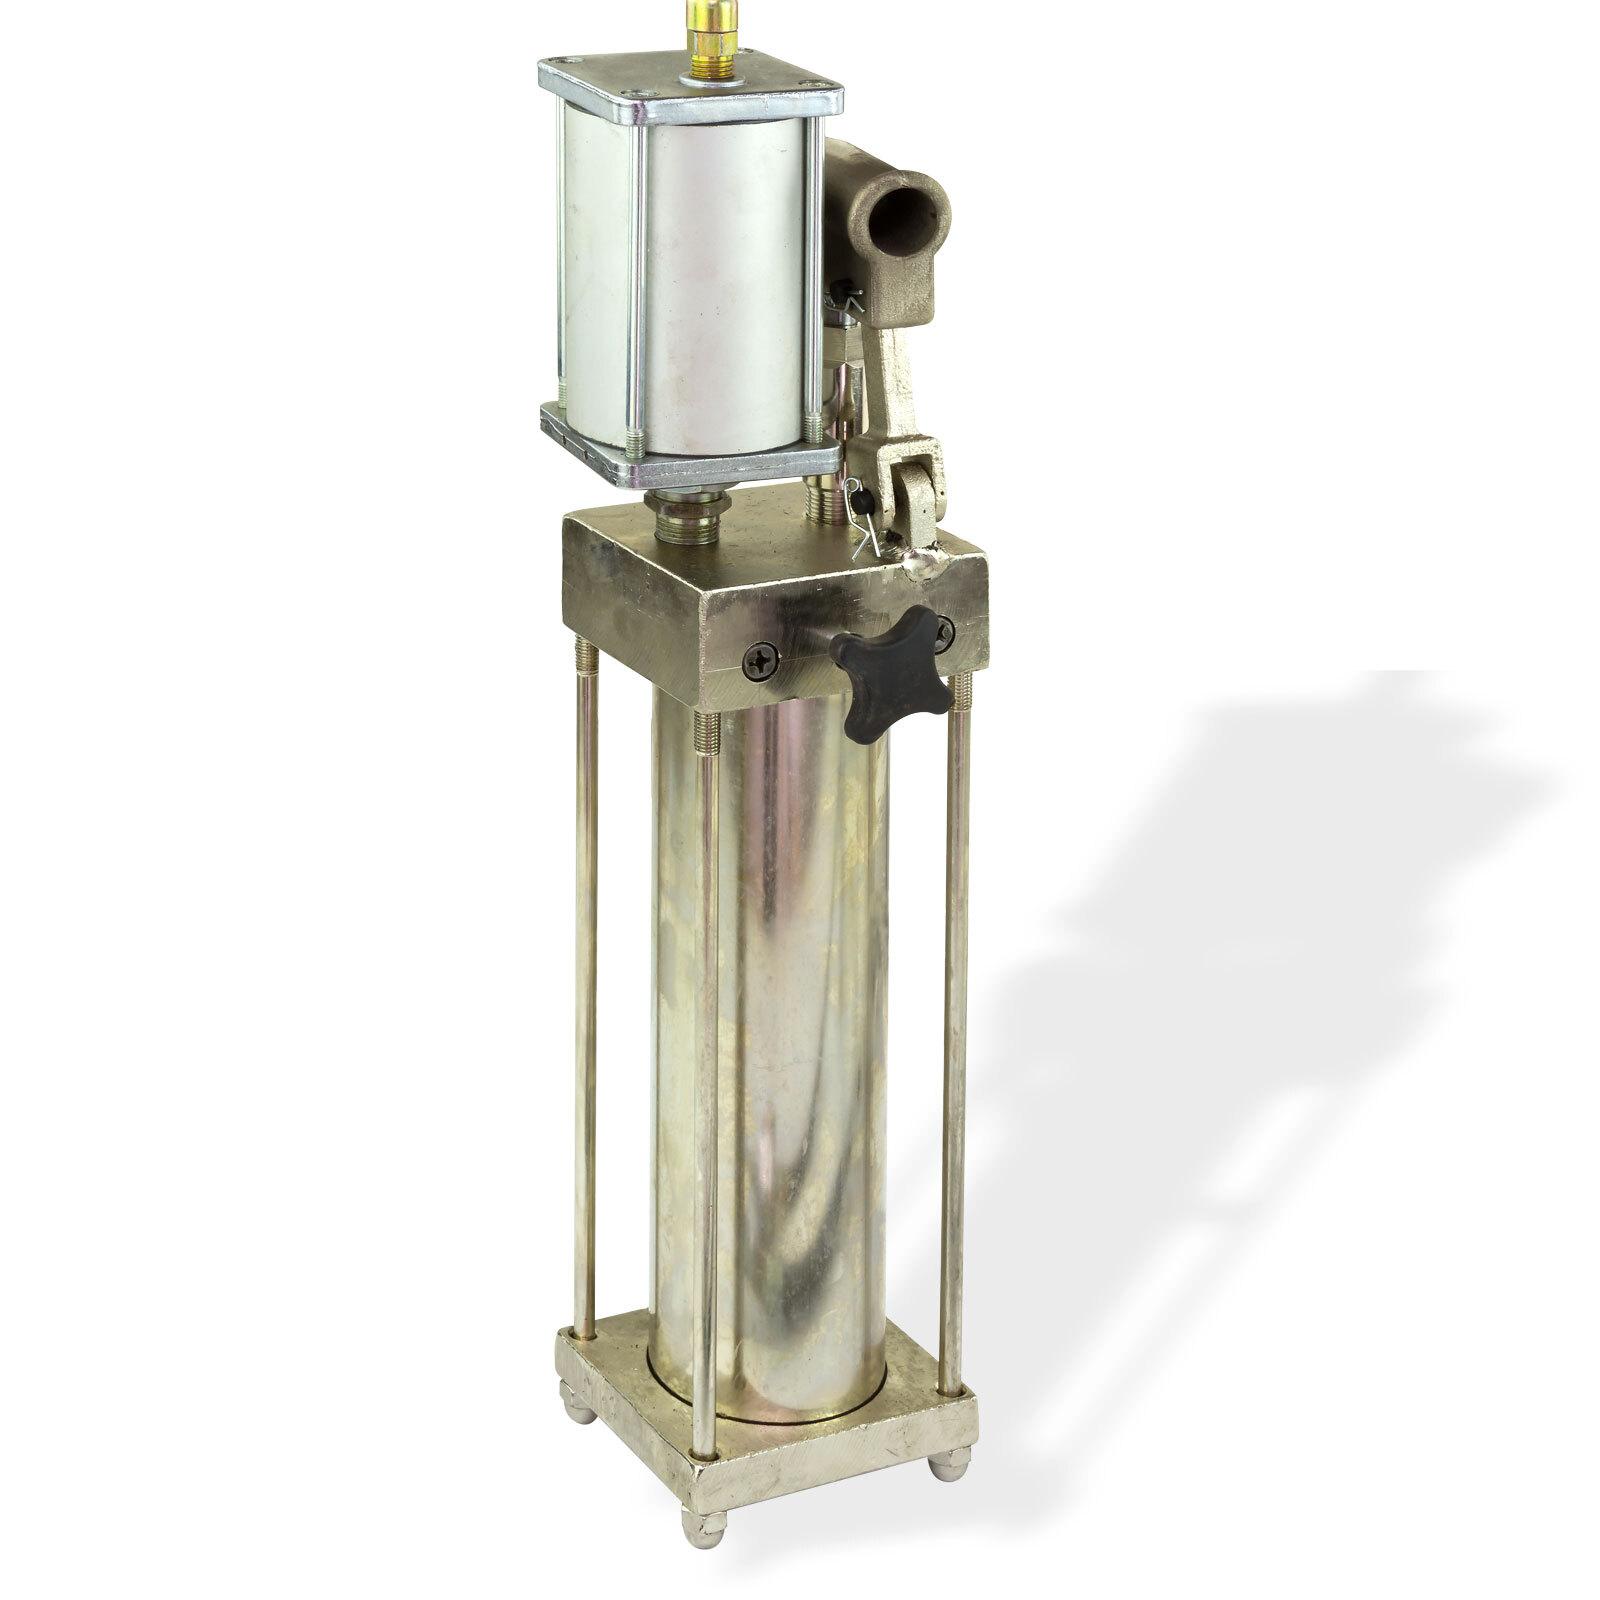 pneumatik hydraulische pumpe druckluftpumpe f r 30t. Black Bedroom Furniture Sets. Home Design Ideas